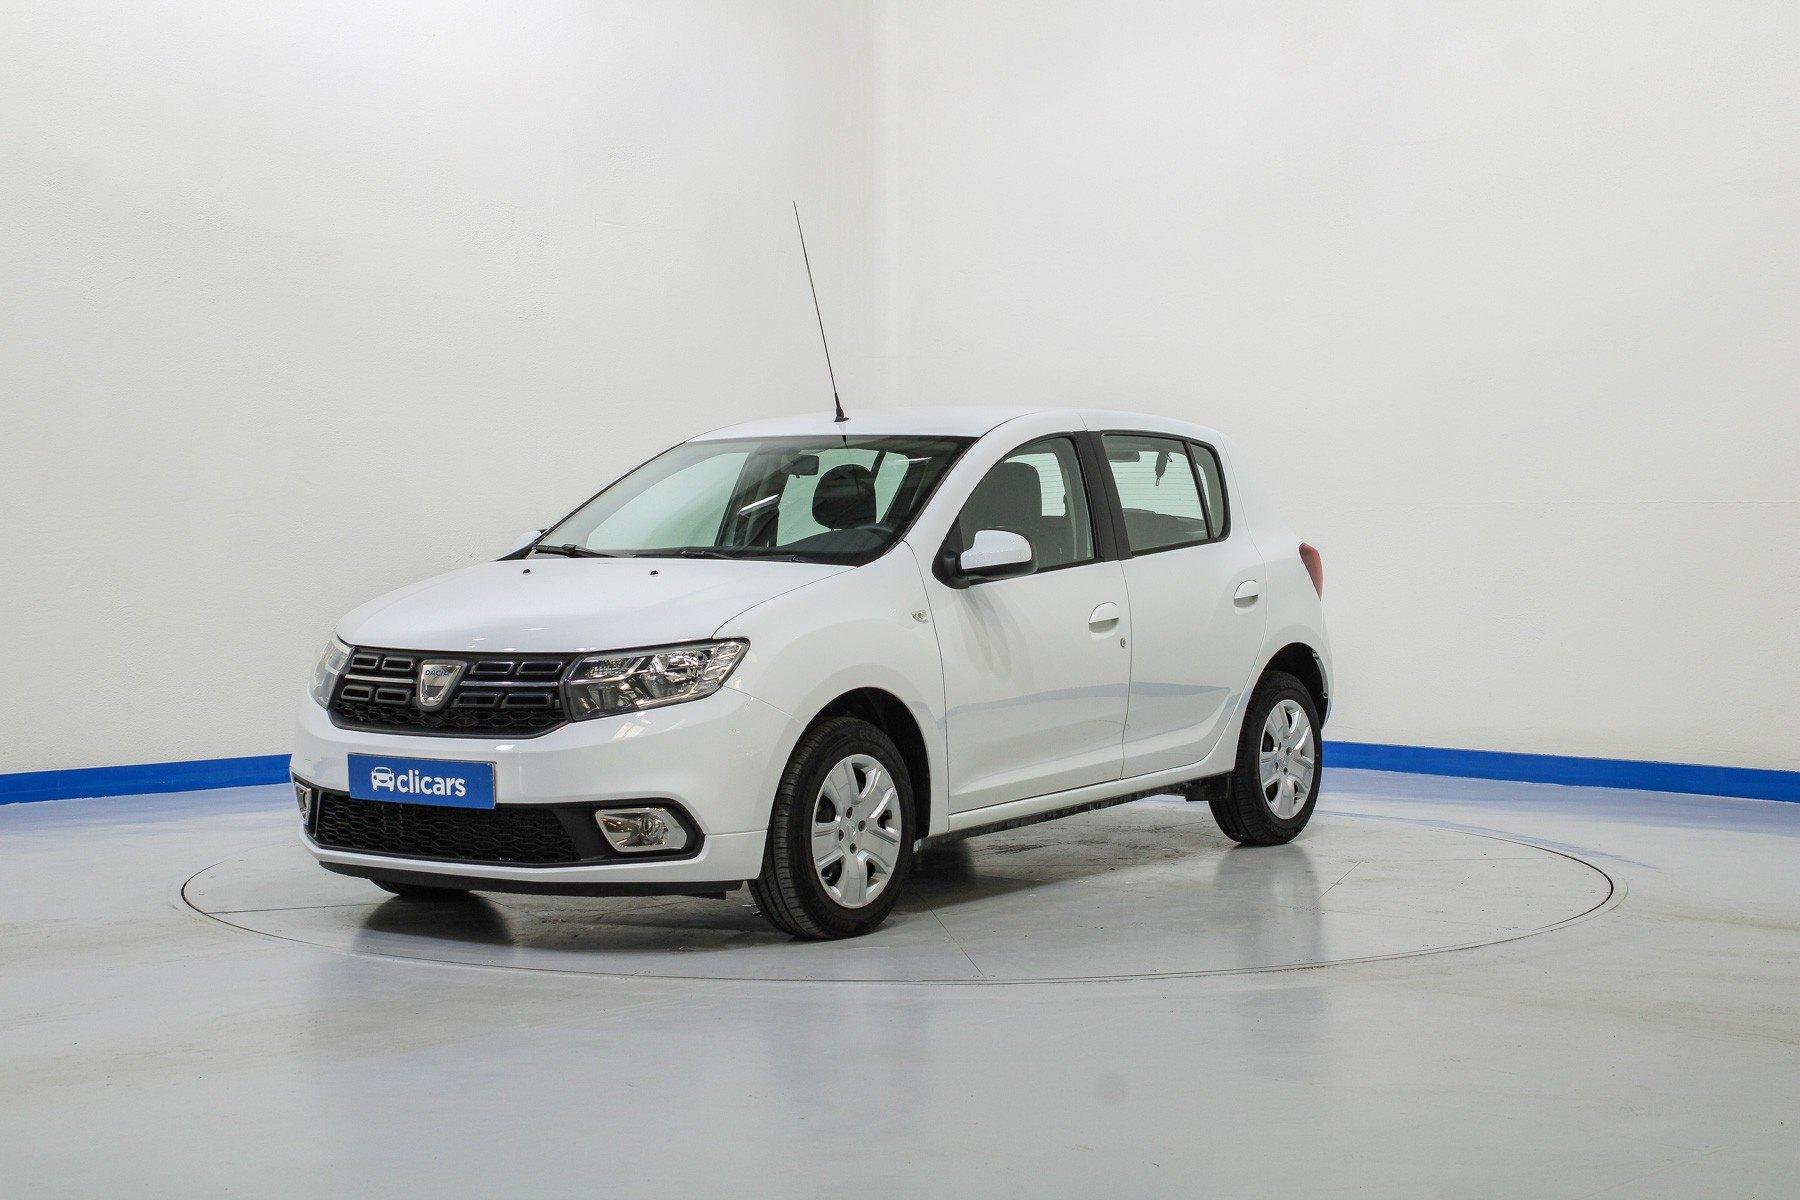 Dacia Sandero Diésel Laureate dCi 66kW (90CV) 1